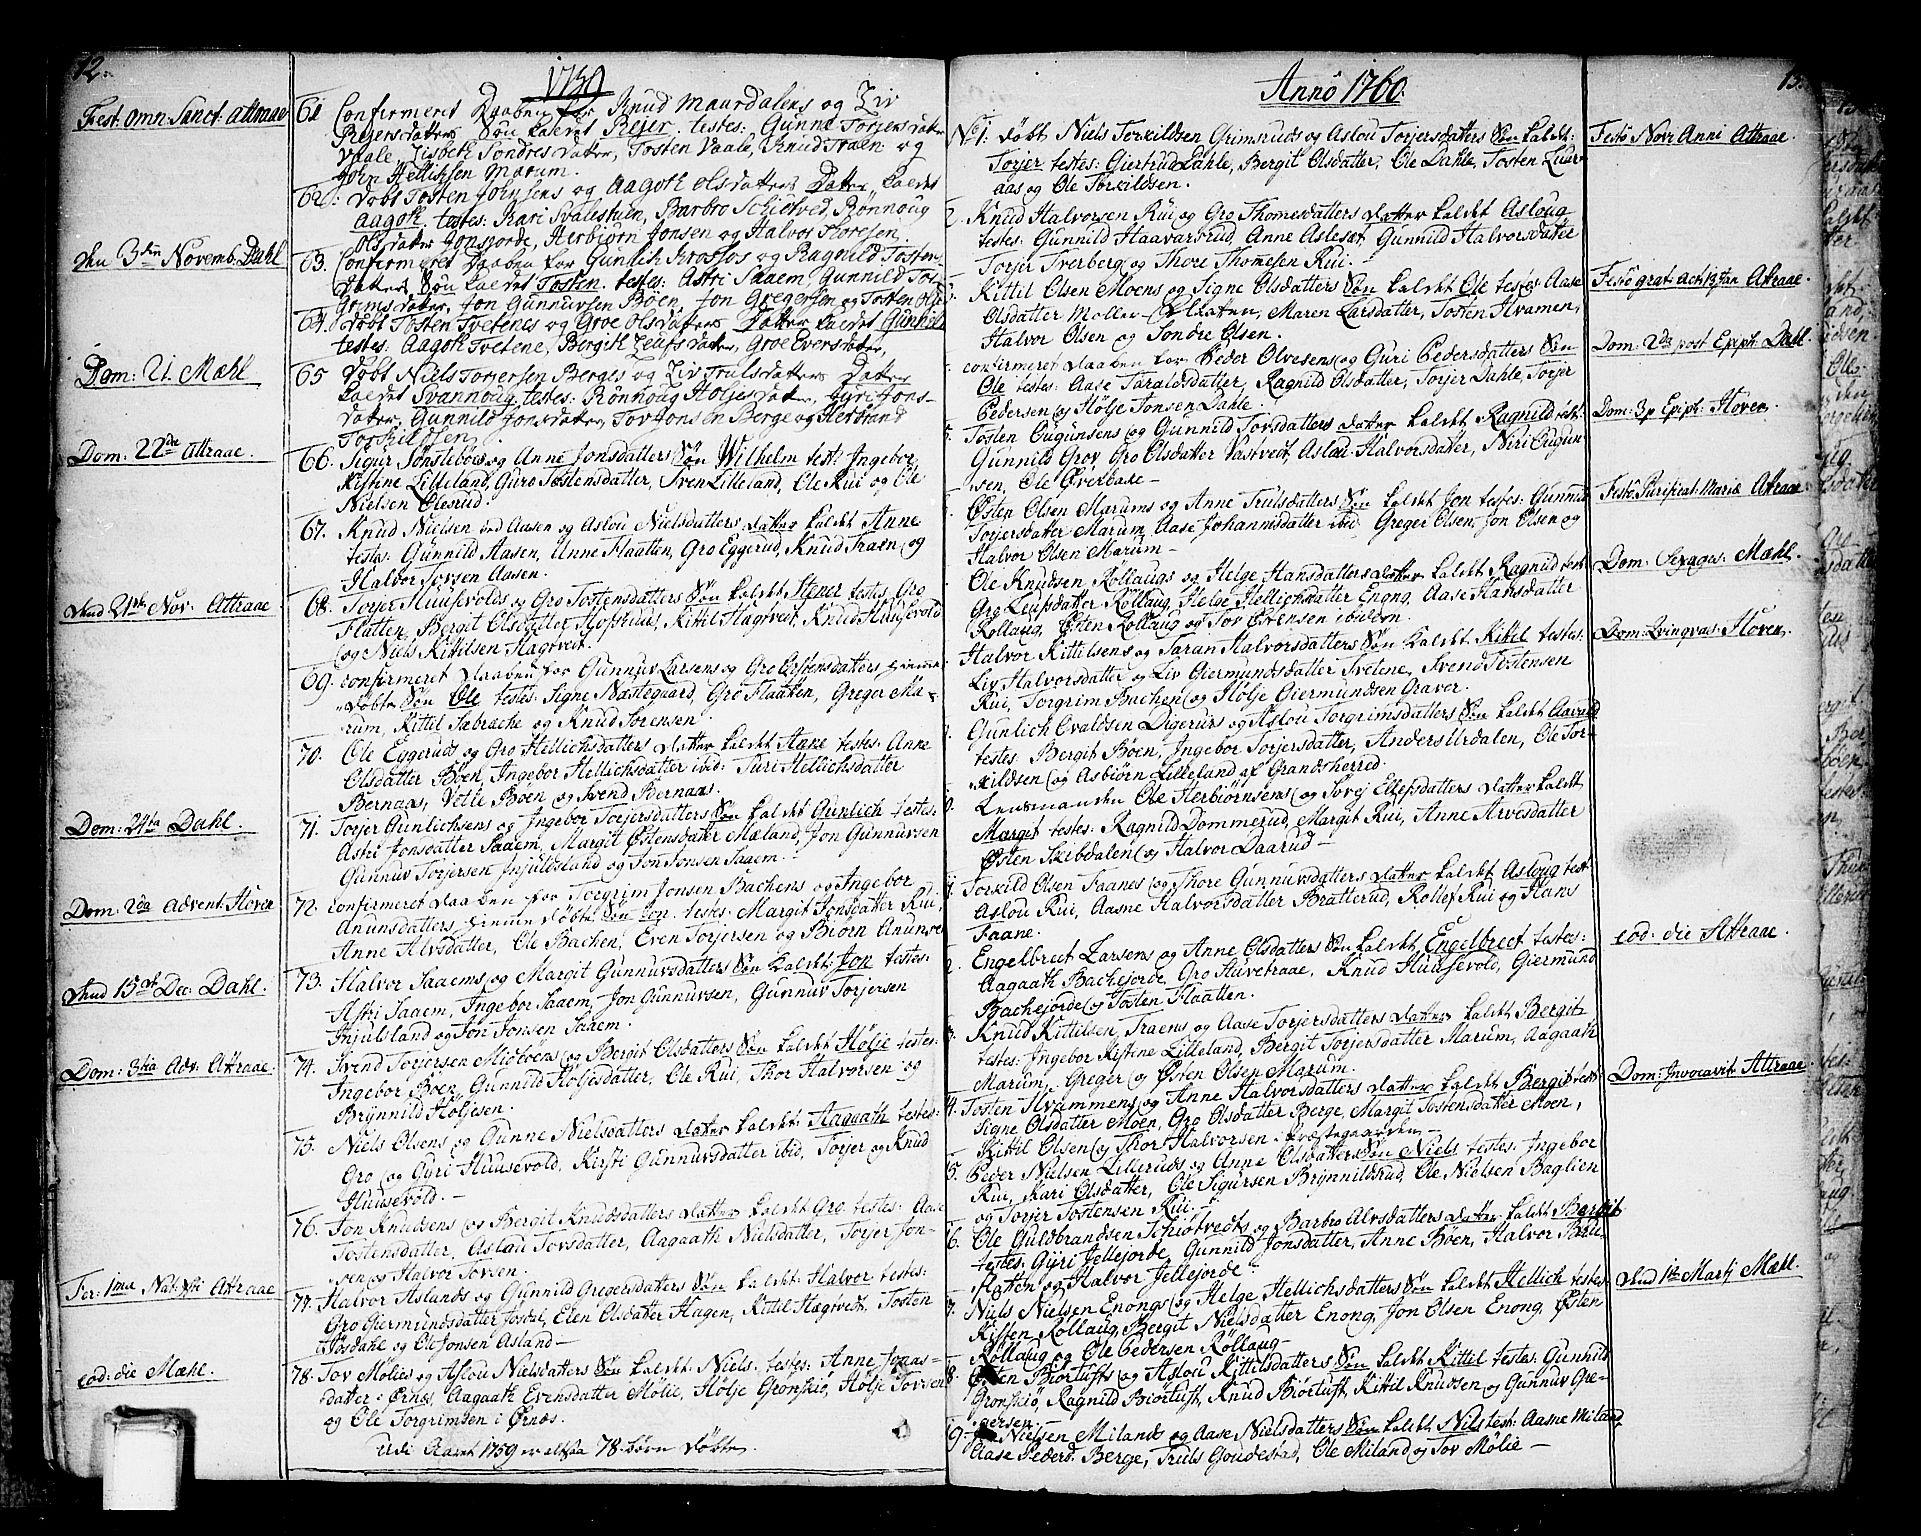 SAKO, Tinn kirkebøker, F/Fa/L0002: Ministerialbok nr. I 2, 1757-1810, s. 12-13